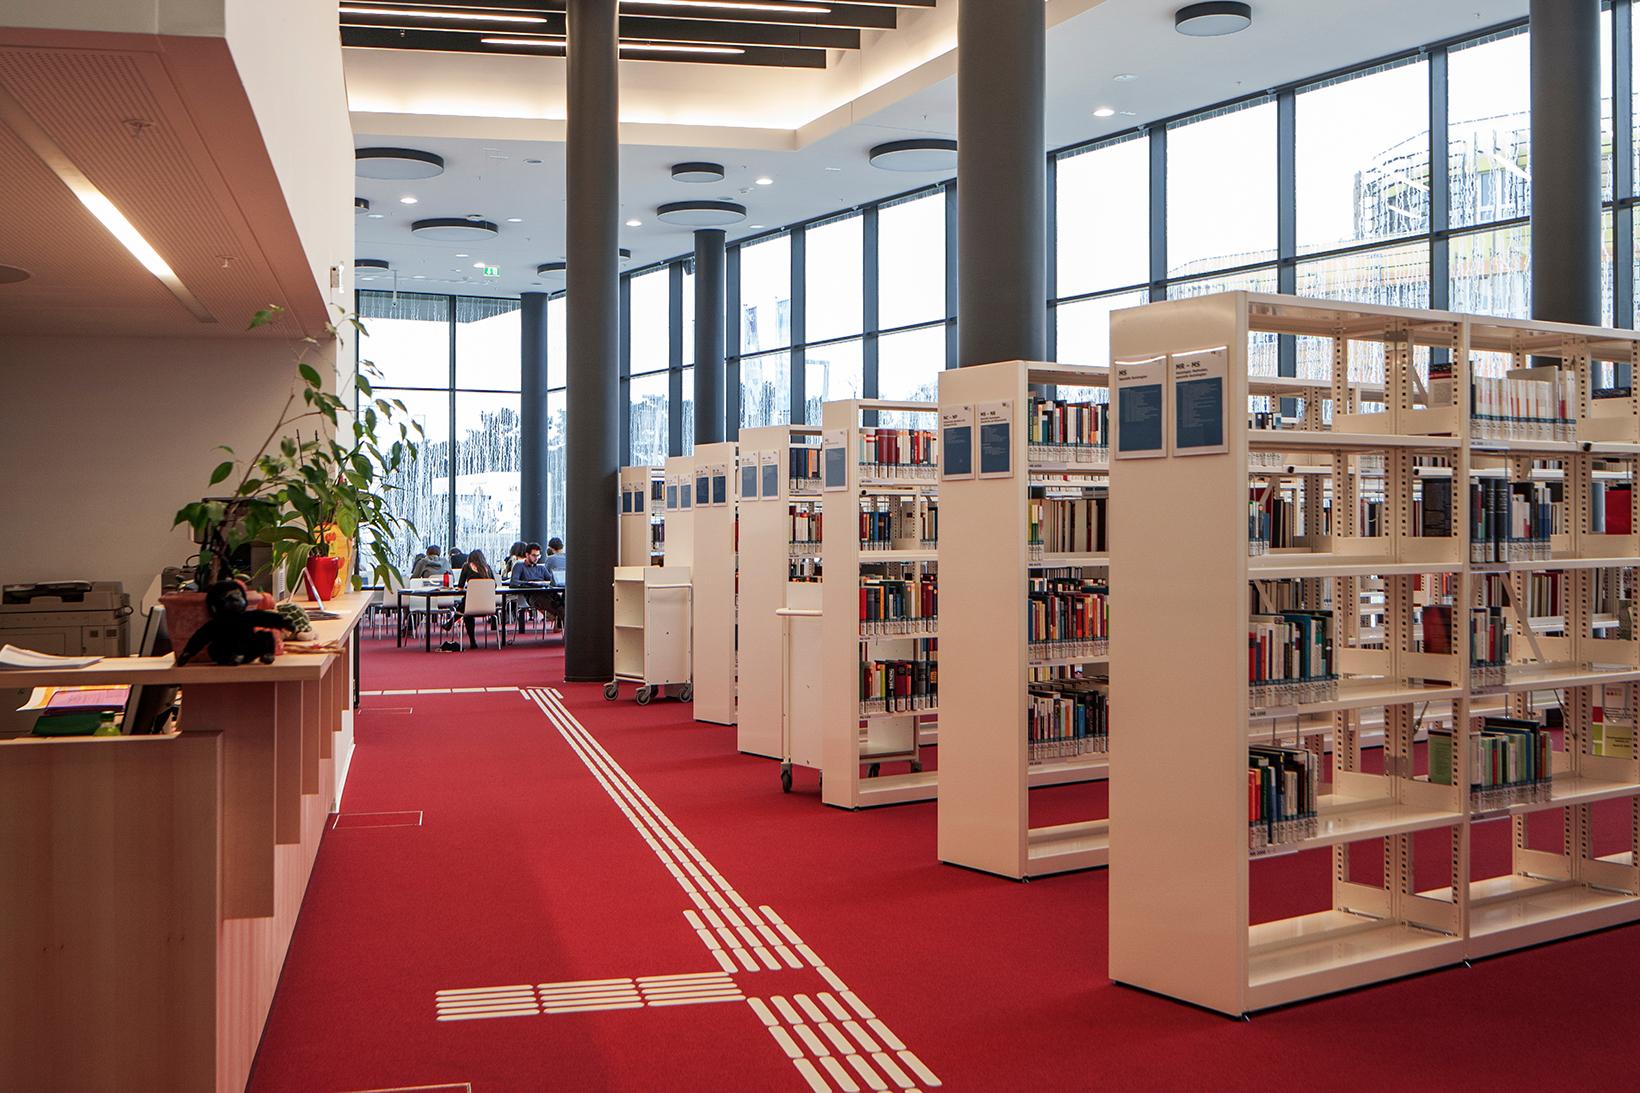 Campus WU, Bibliothek D4 (c) BOAnet